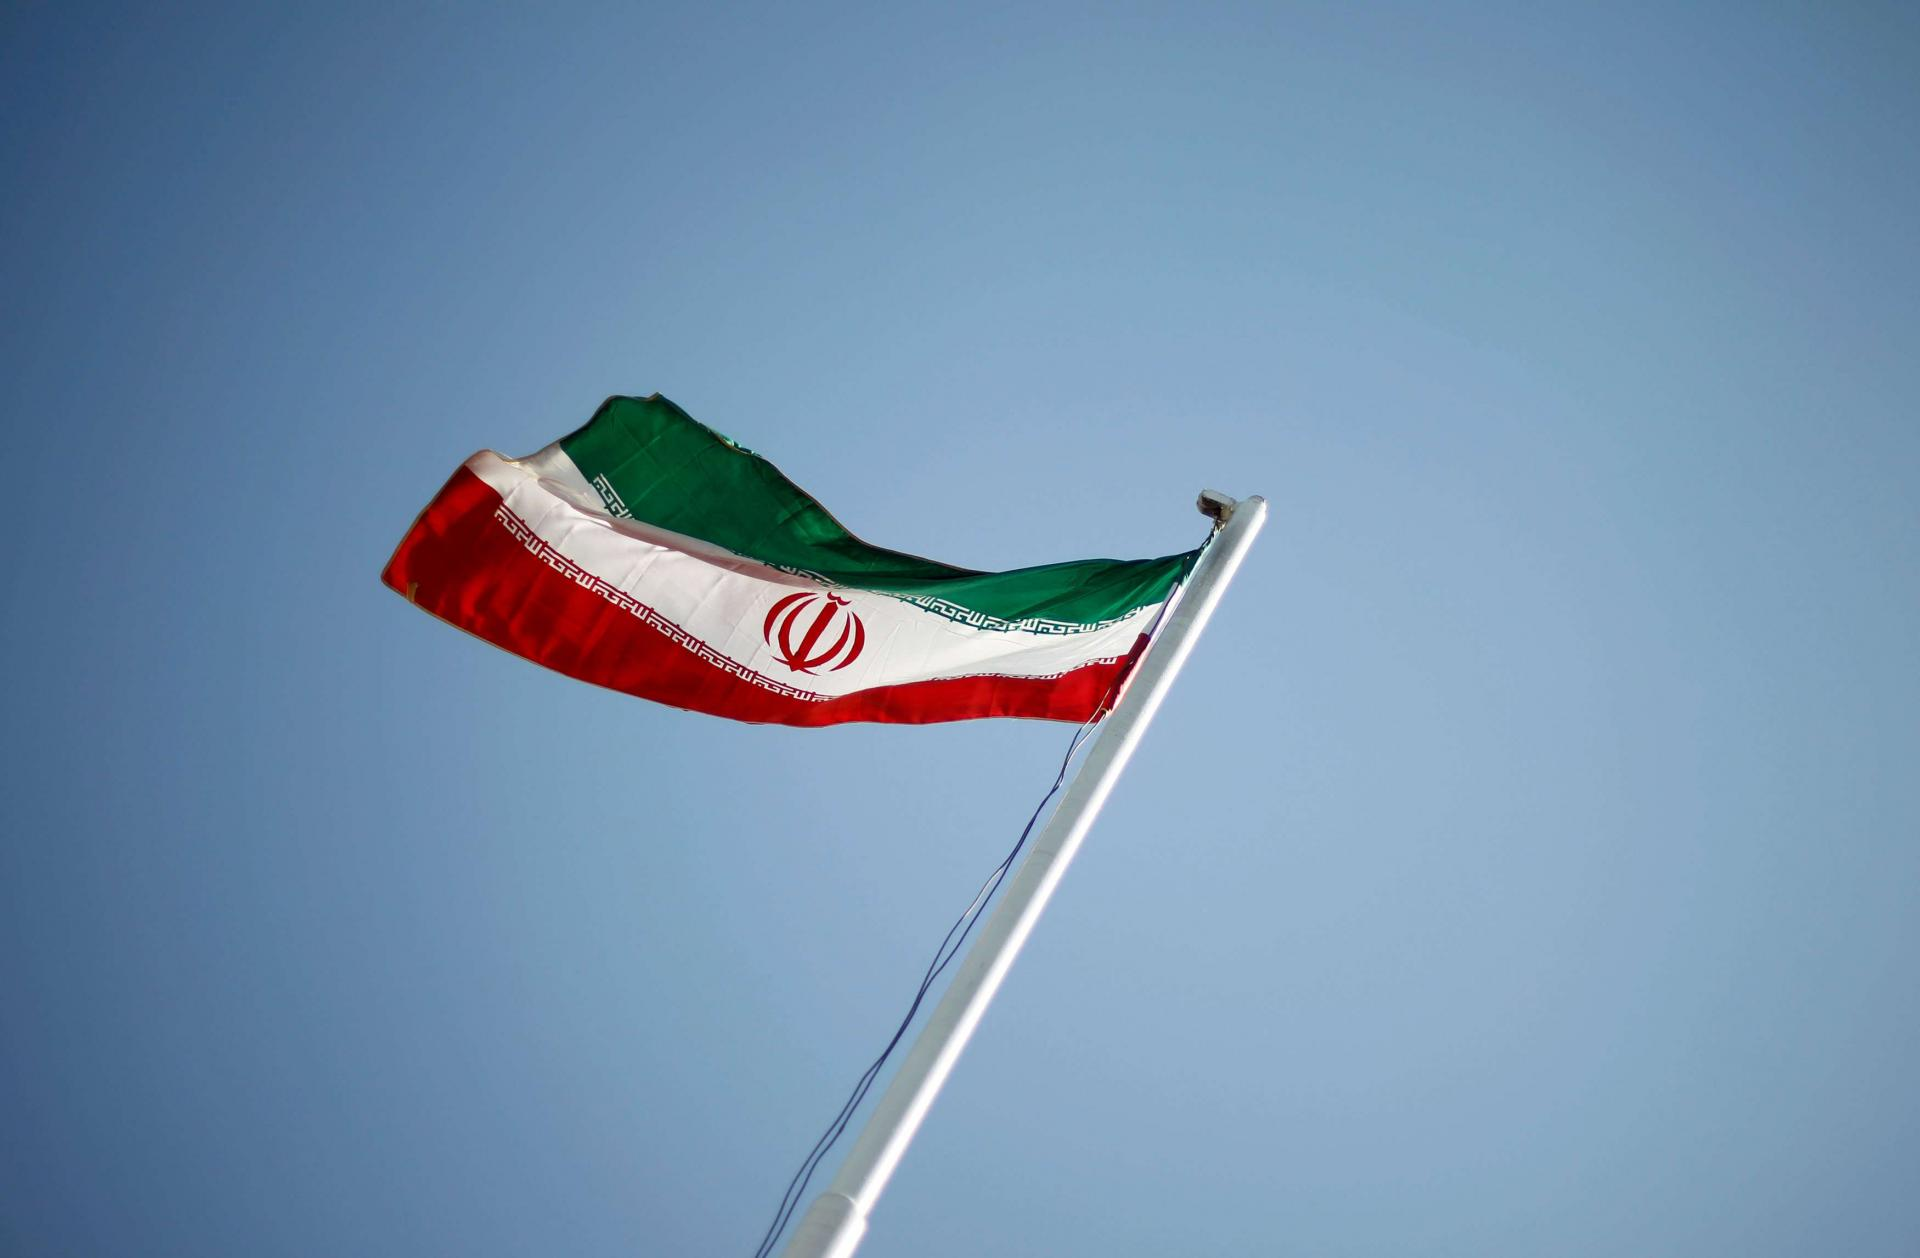 iran ulke disinda cikarilmis kripto paralarin alim satimini yasakladi